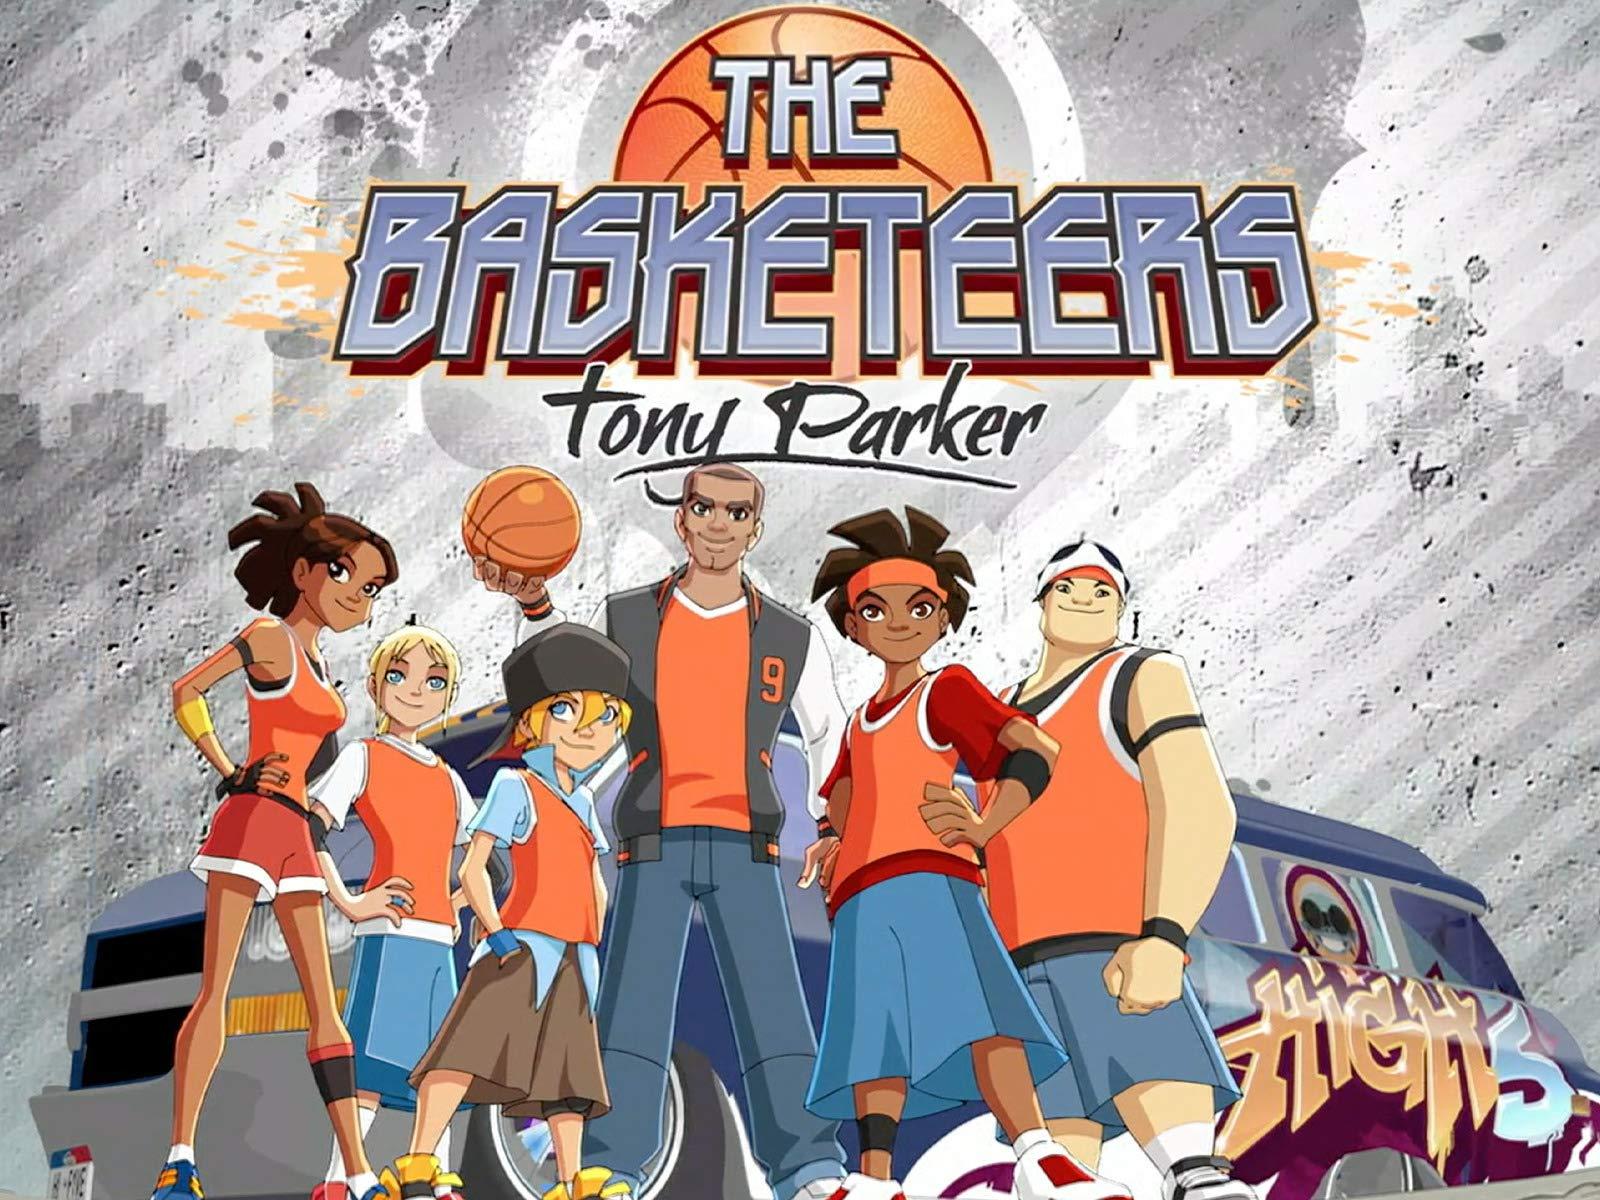 The Basketeers